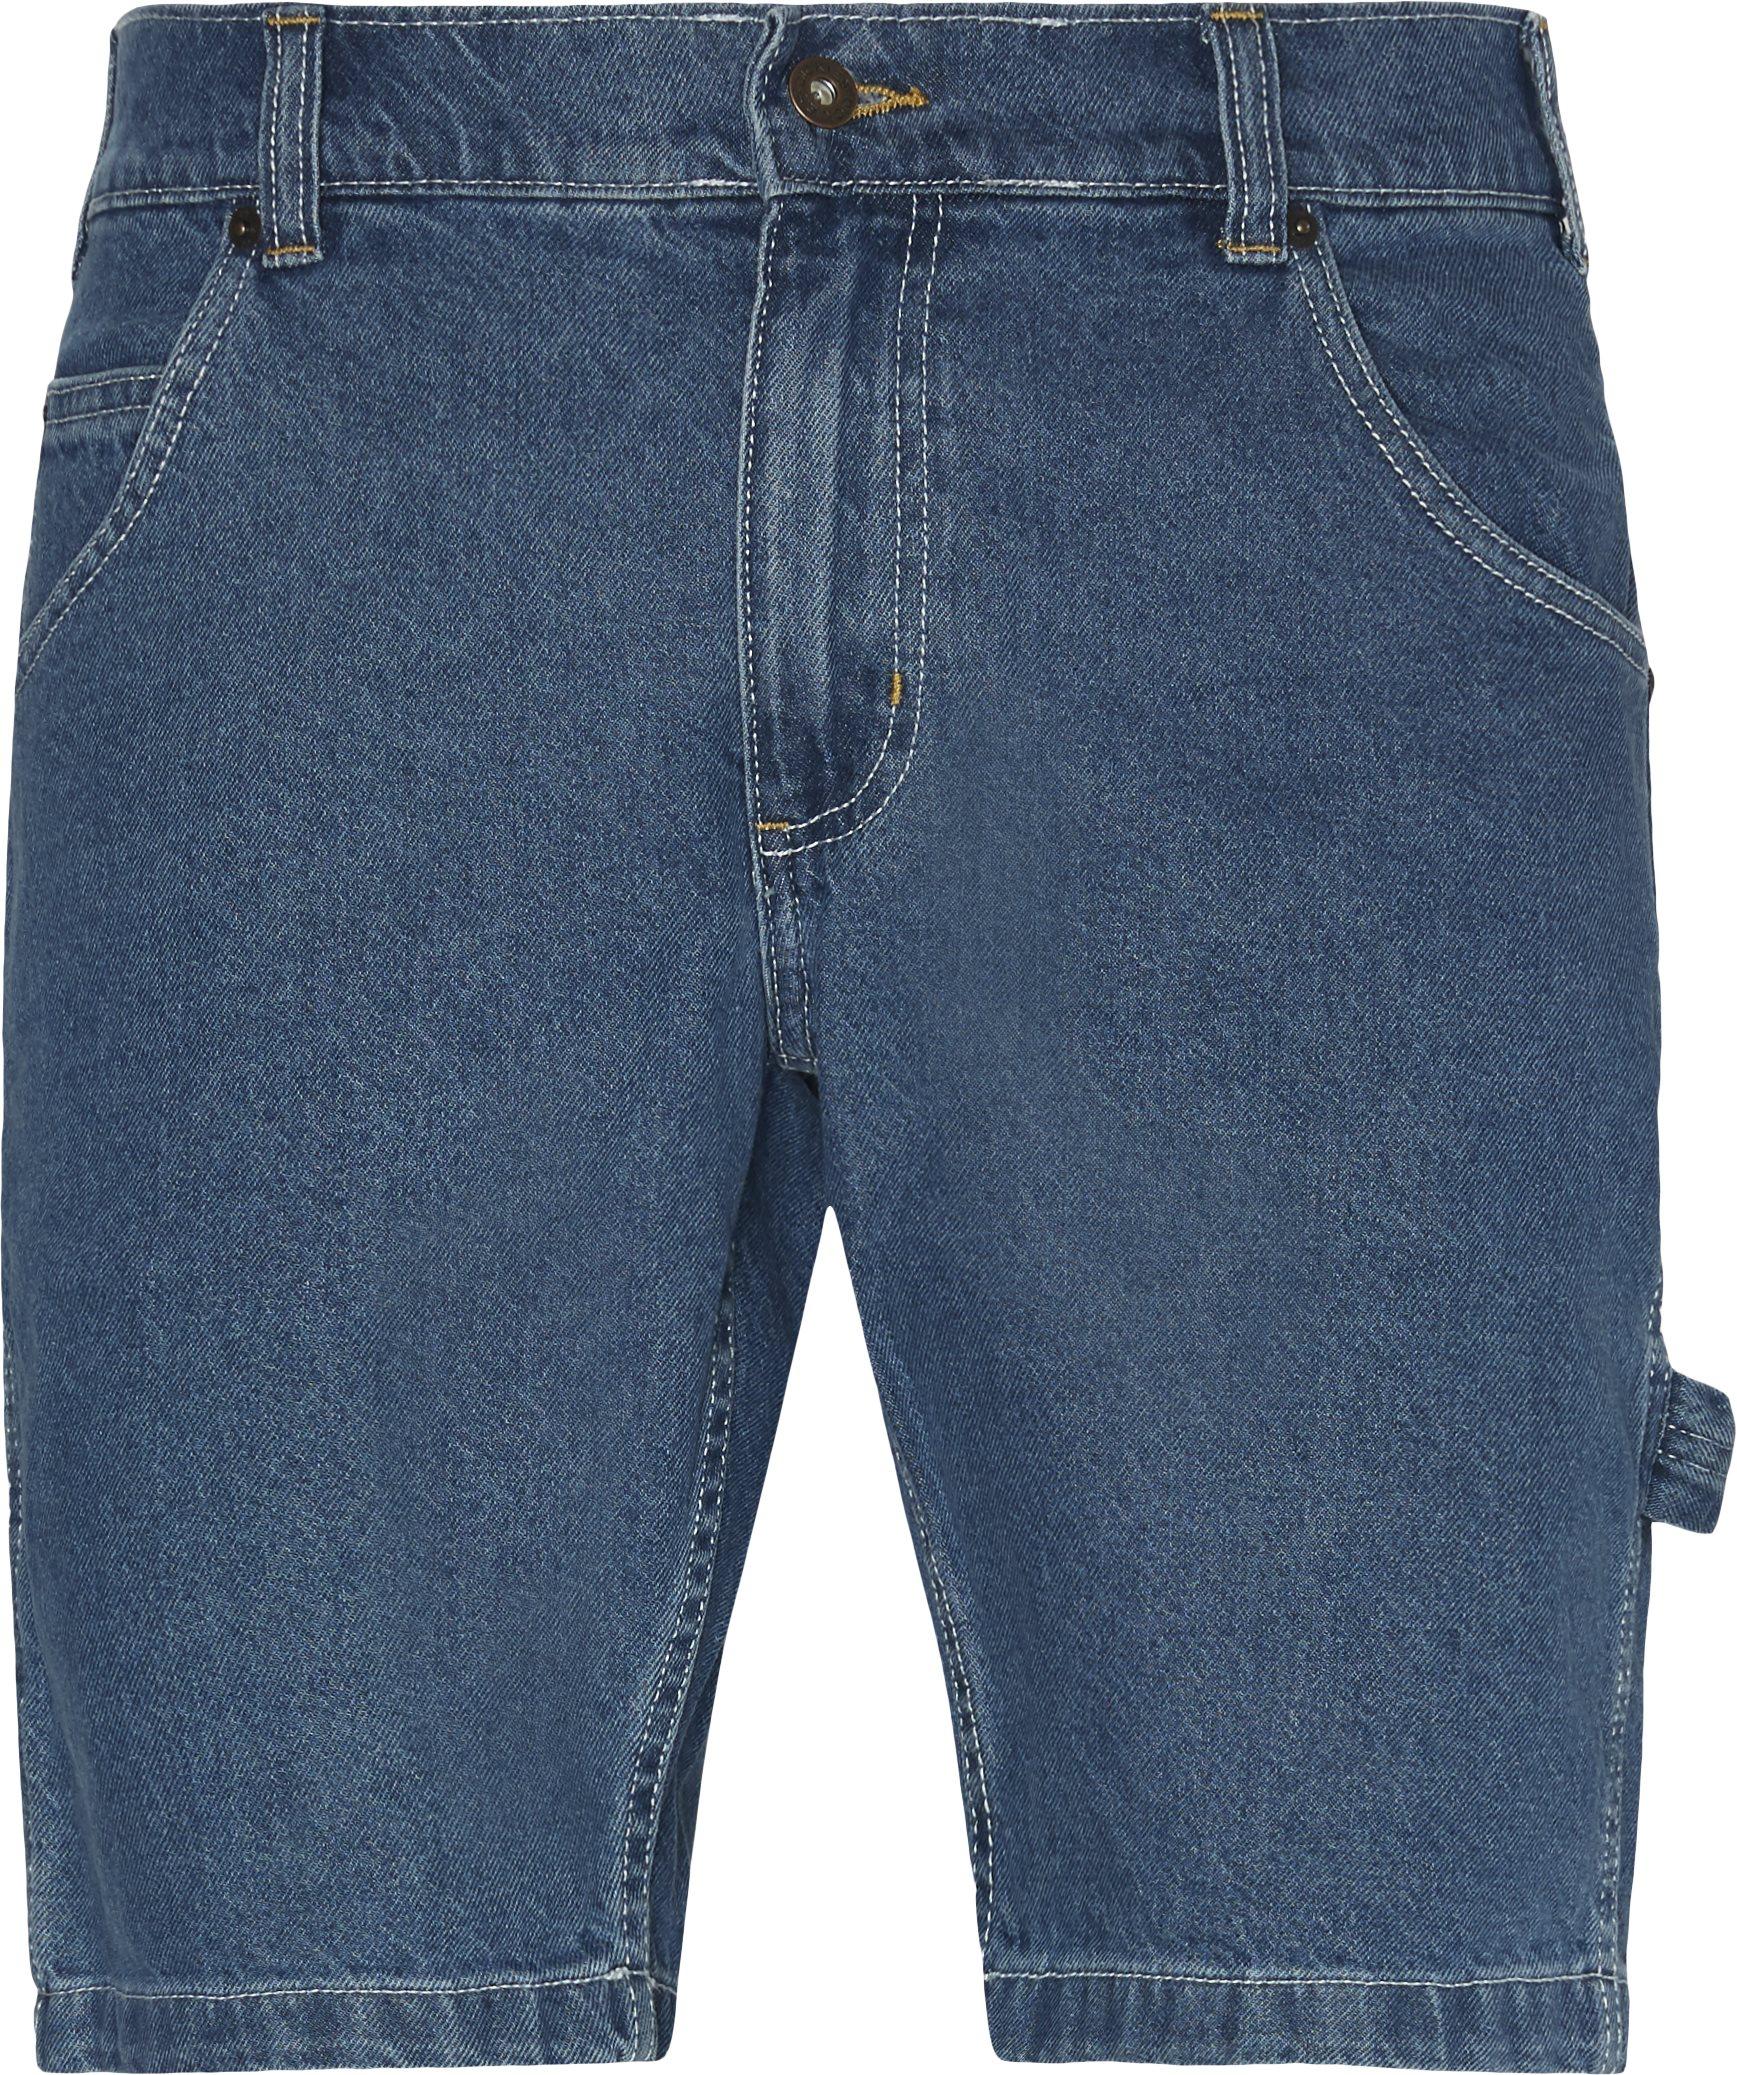 Hillsdale Short - Shorts - Regular - Blå